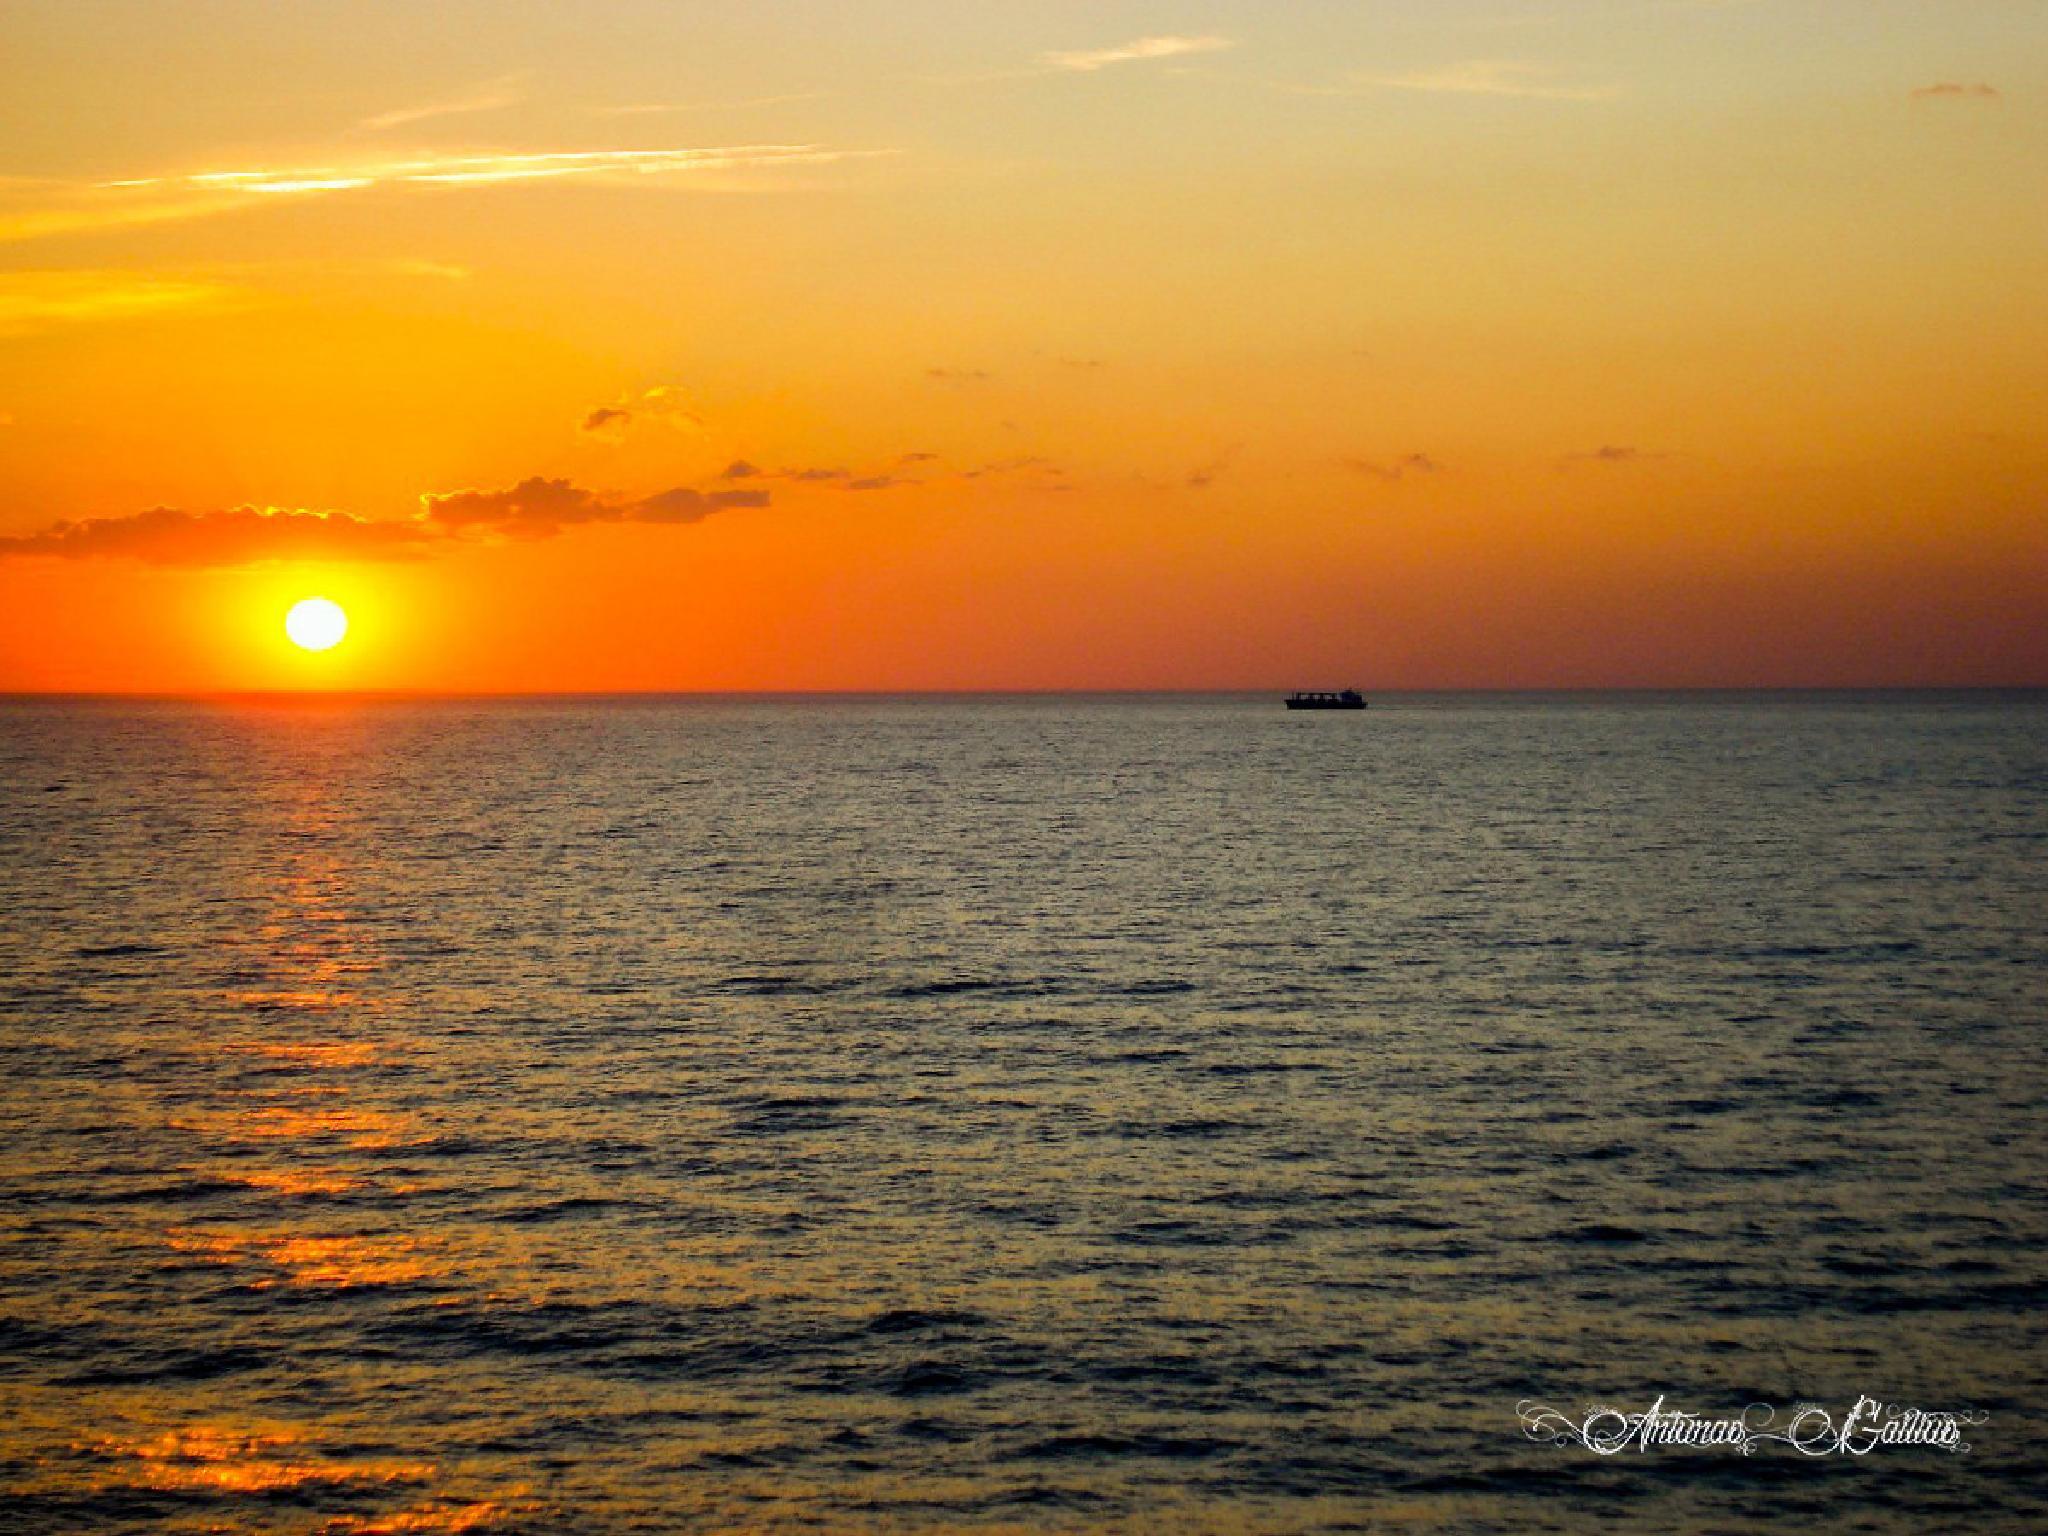 Sunset by Arturas Gailius